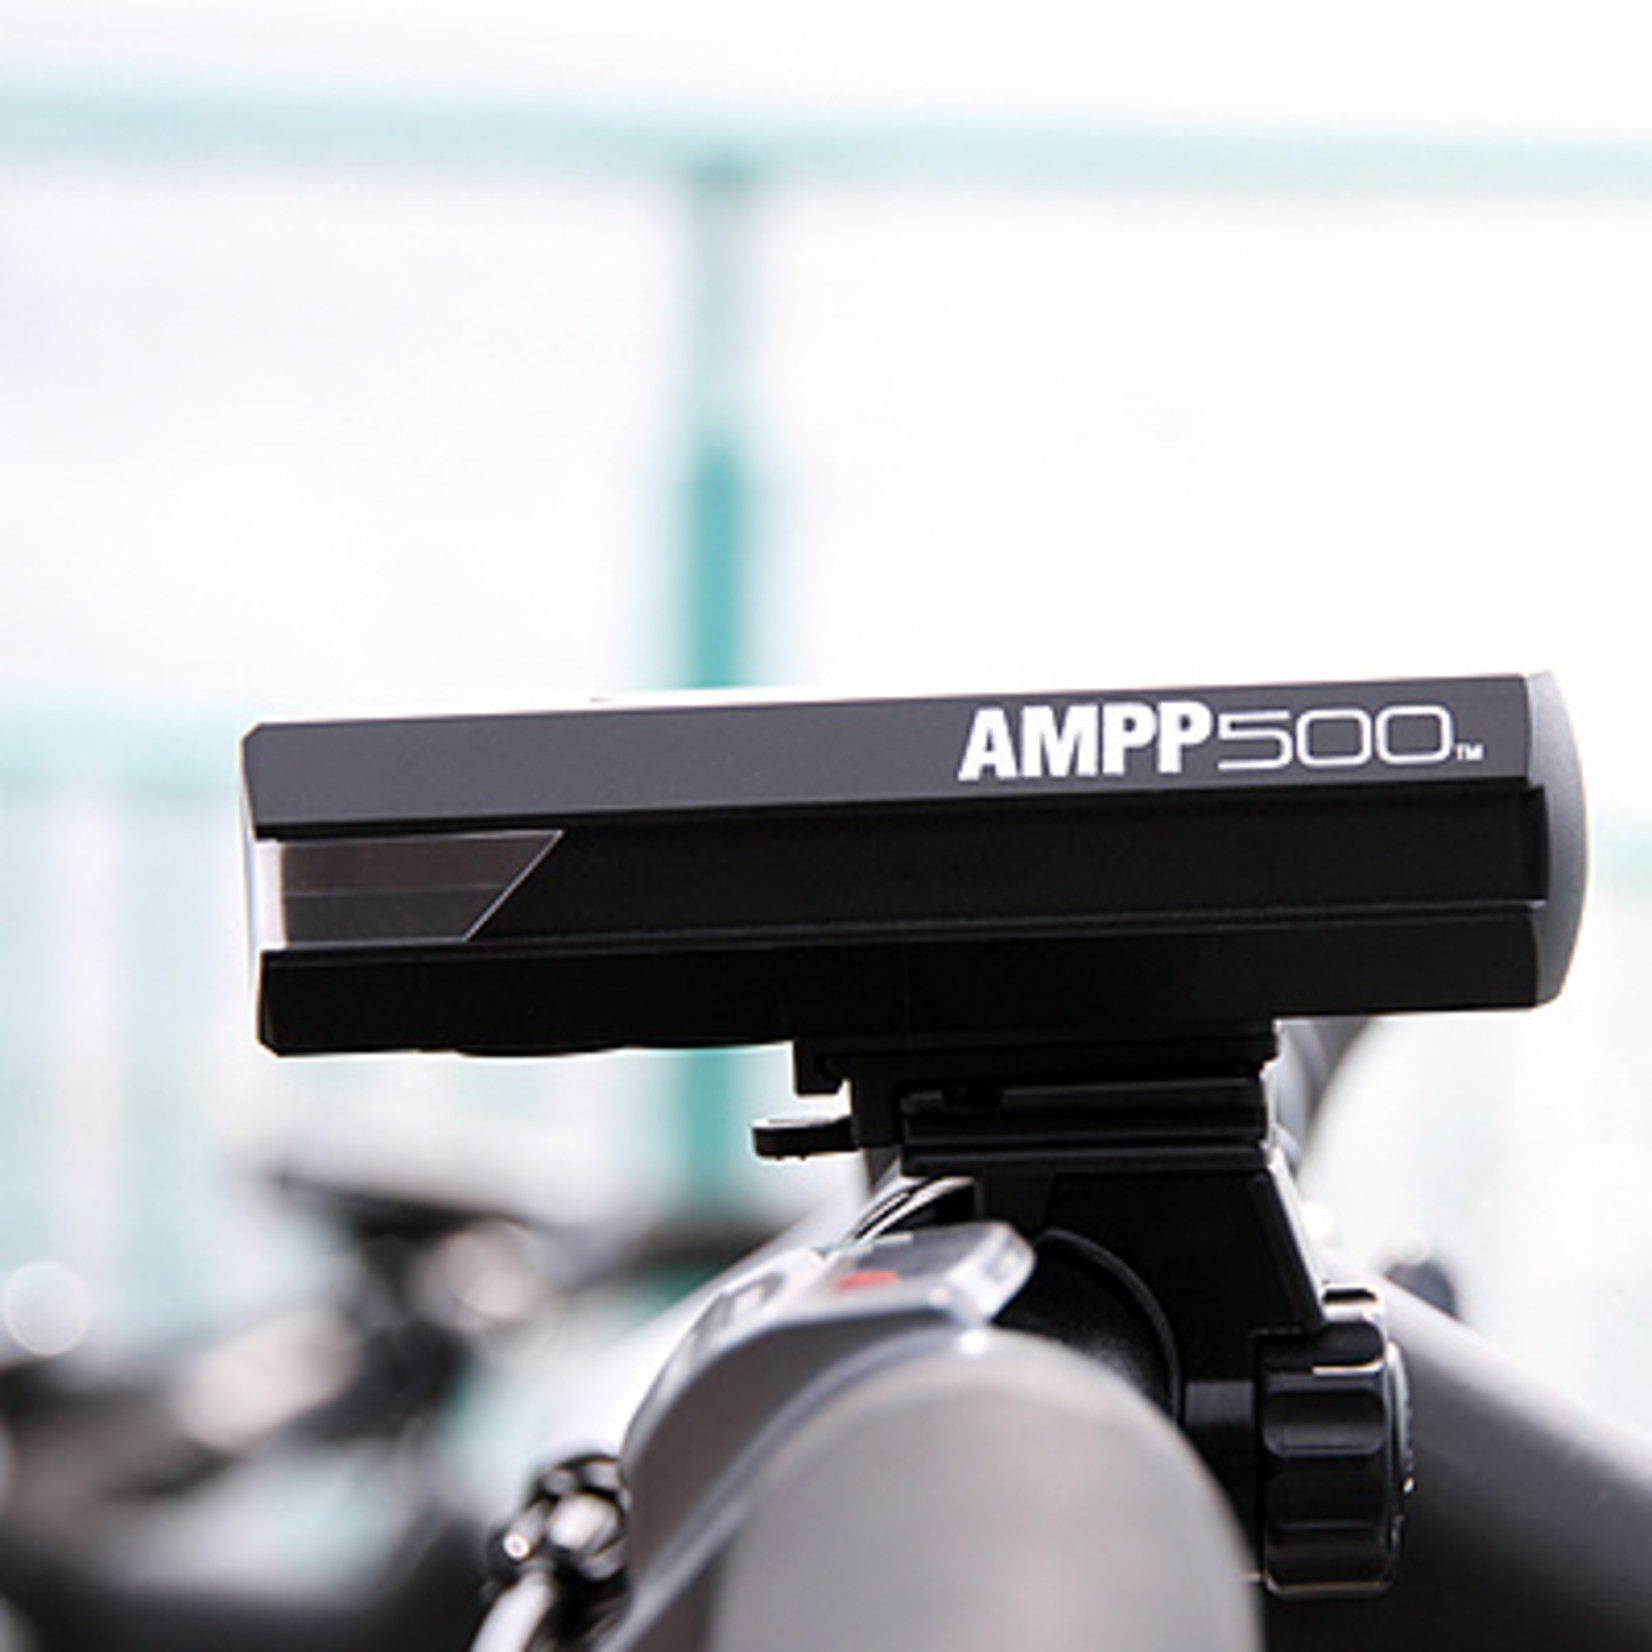 Cateye CATEYE AMPP 500 FRONT